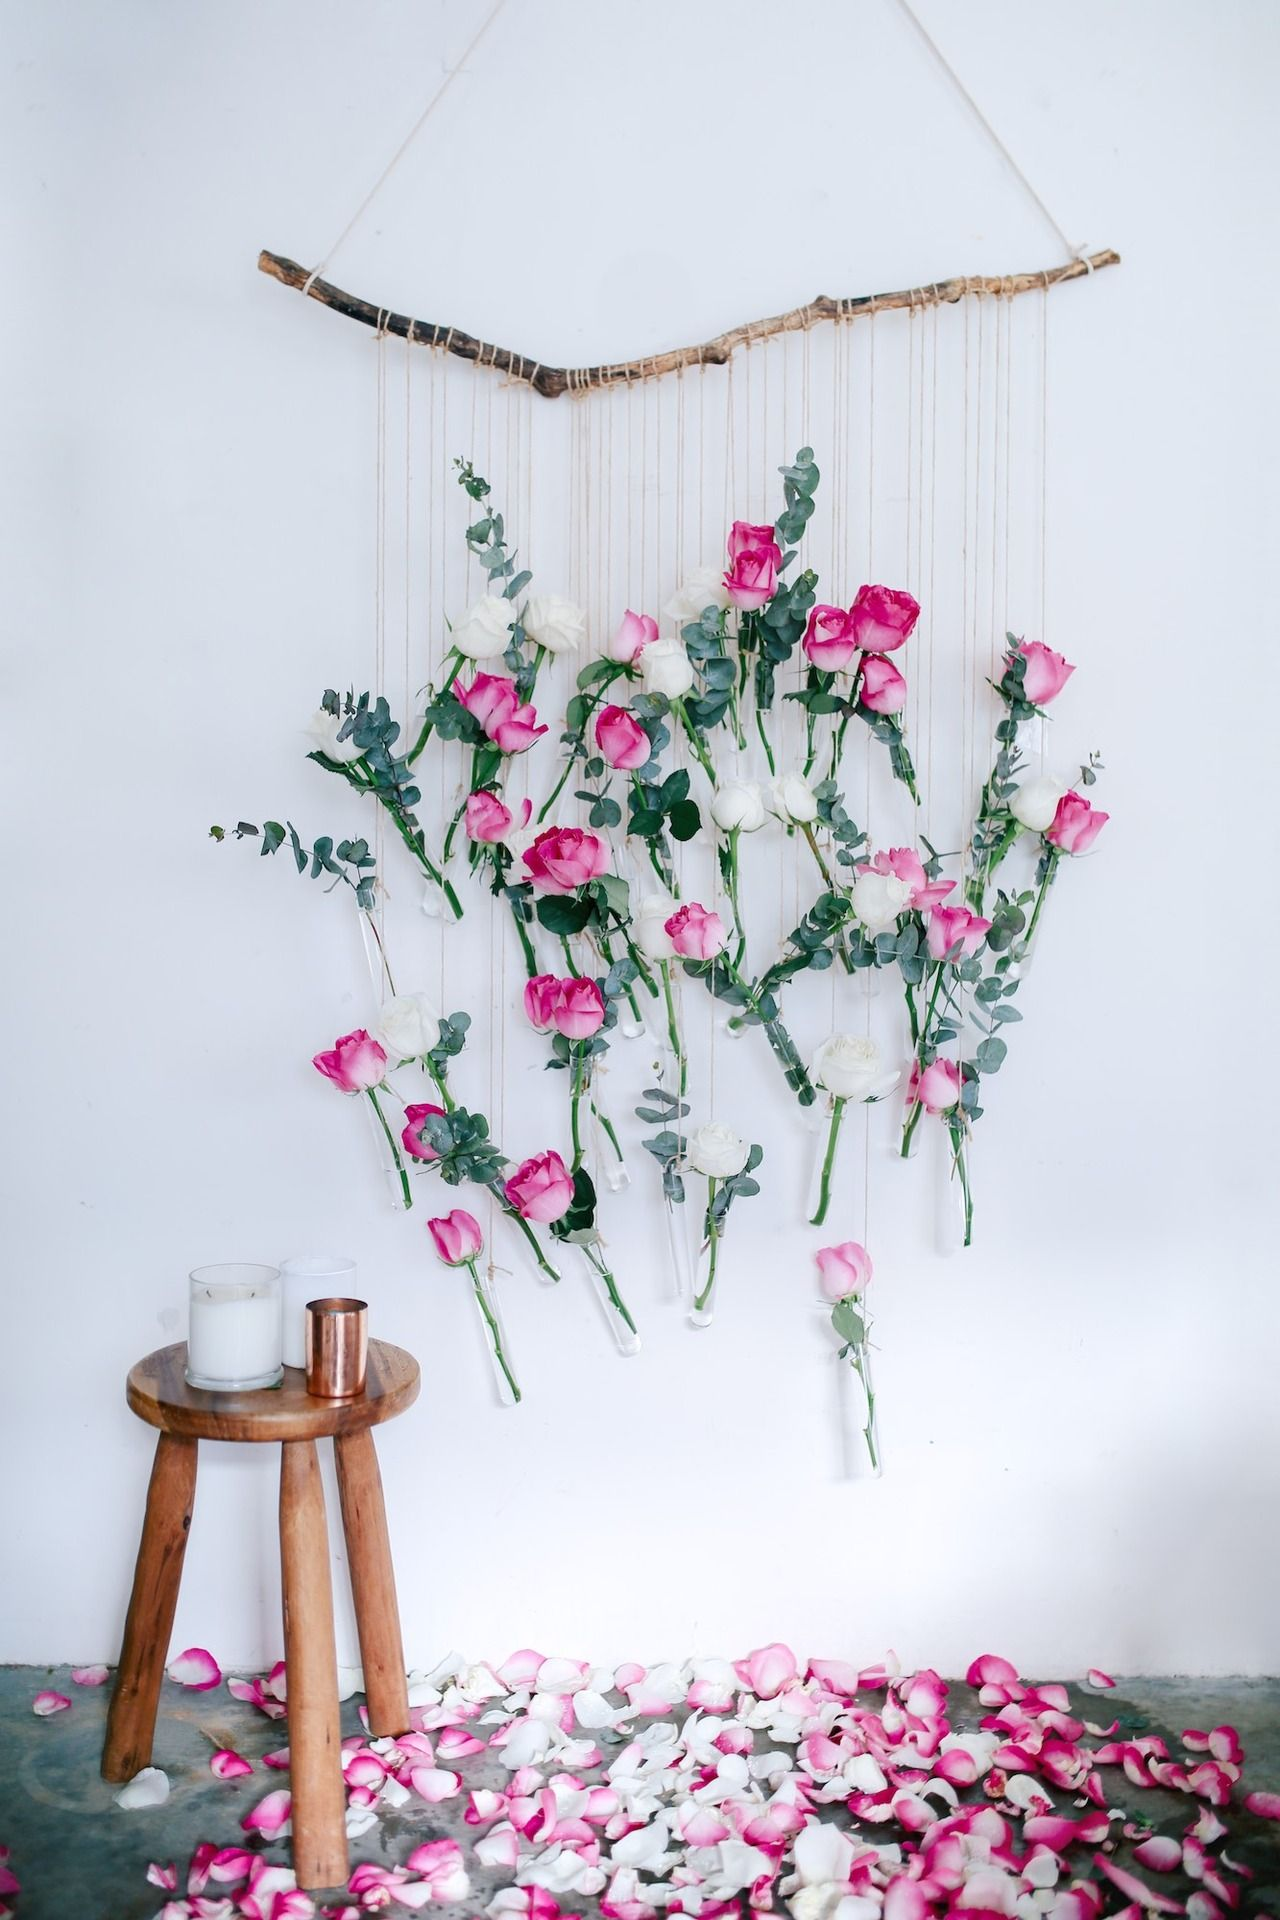 Diy floral vase wall hanging using rose and eucalyptus